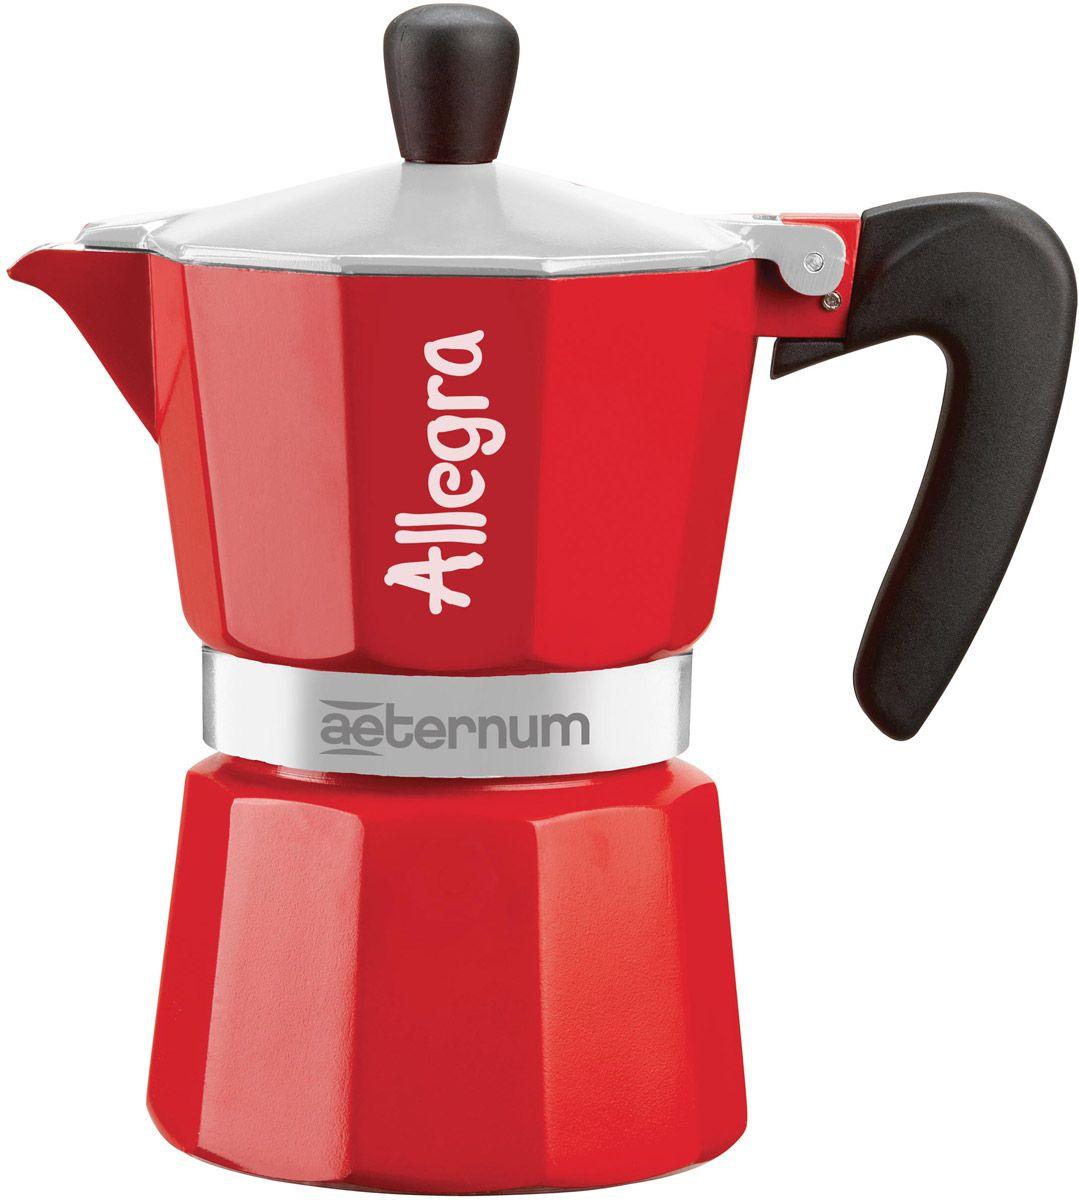 Гейзерная кофеварка Bialetti Aeternum Allegra Rossa, на 6 чашек, красный кофеварка гейзерная bialetti aeternum elegance 6 порций алюминий 6008